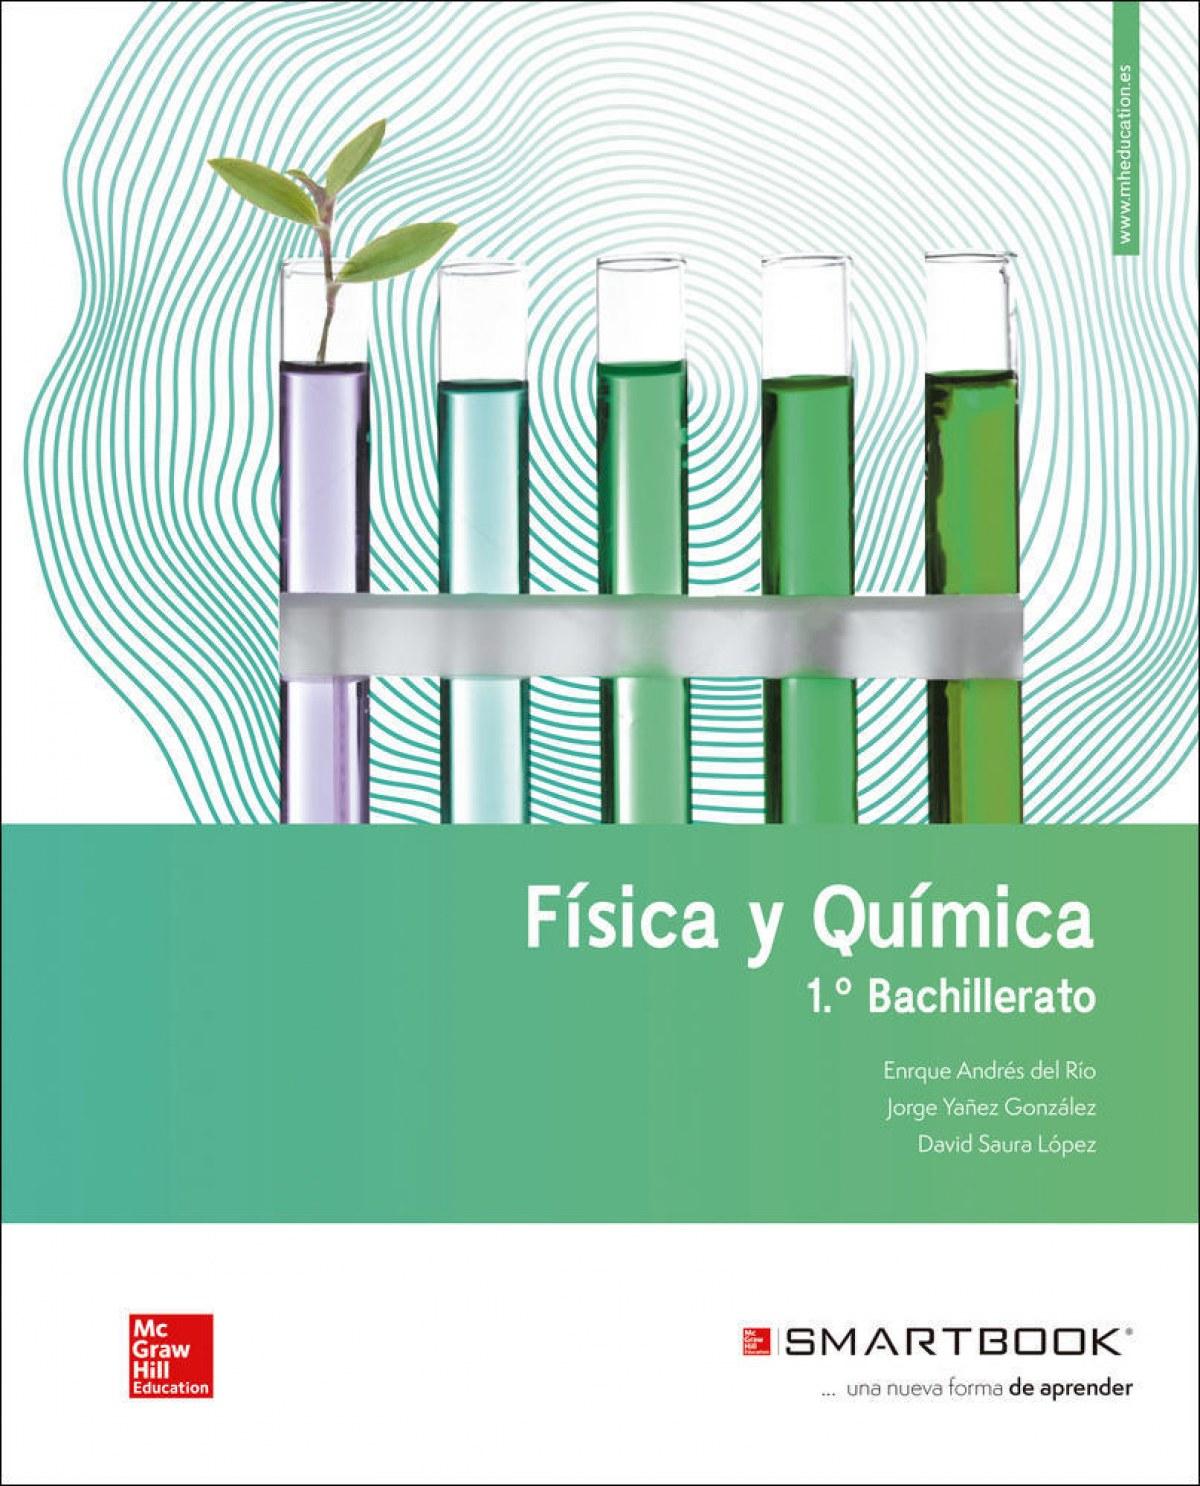 FÍSICA Y QUÍMICA 1o.BACHILLERATO (+SMARTBOOK). NOVA 2019 9788448616977